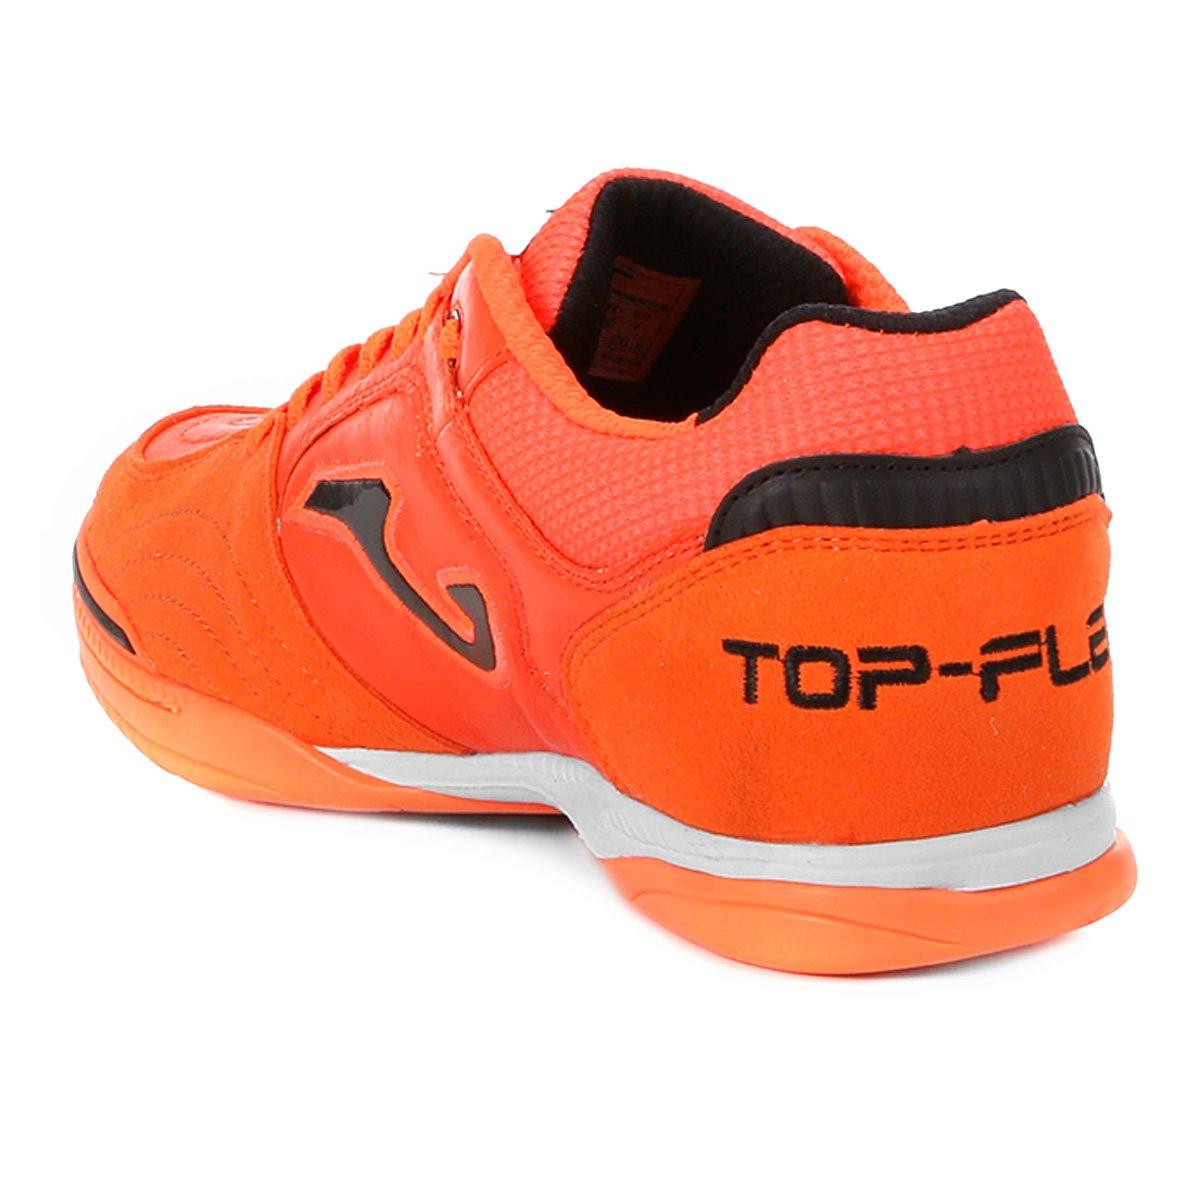 ... Top Joma Futsal Chuteira Futsal Coral Masculina Joma Flex Chuteira IN  Top nwBawpqg ... 372dac8ceaa17